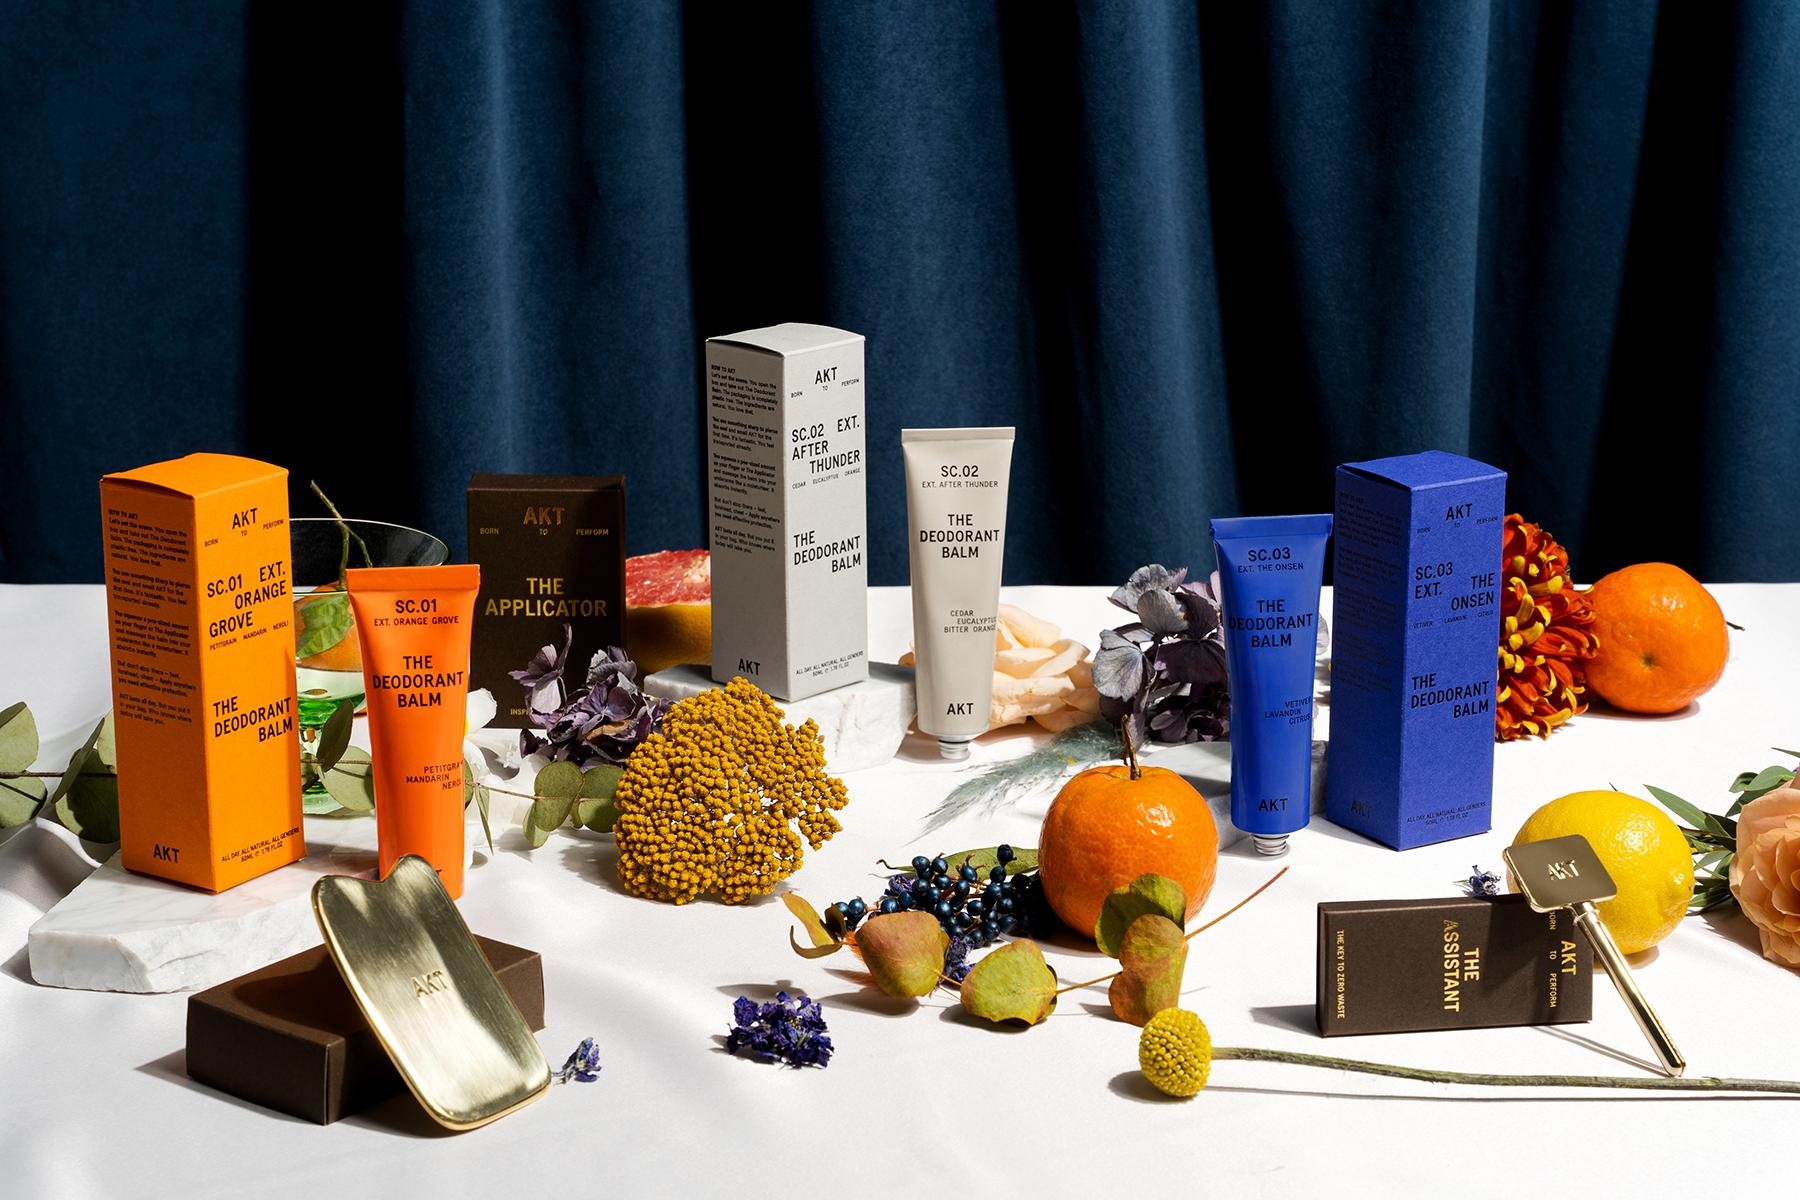 Editorial scene of AKT deodorant products